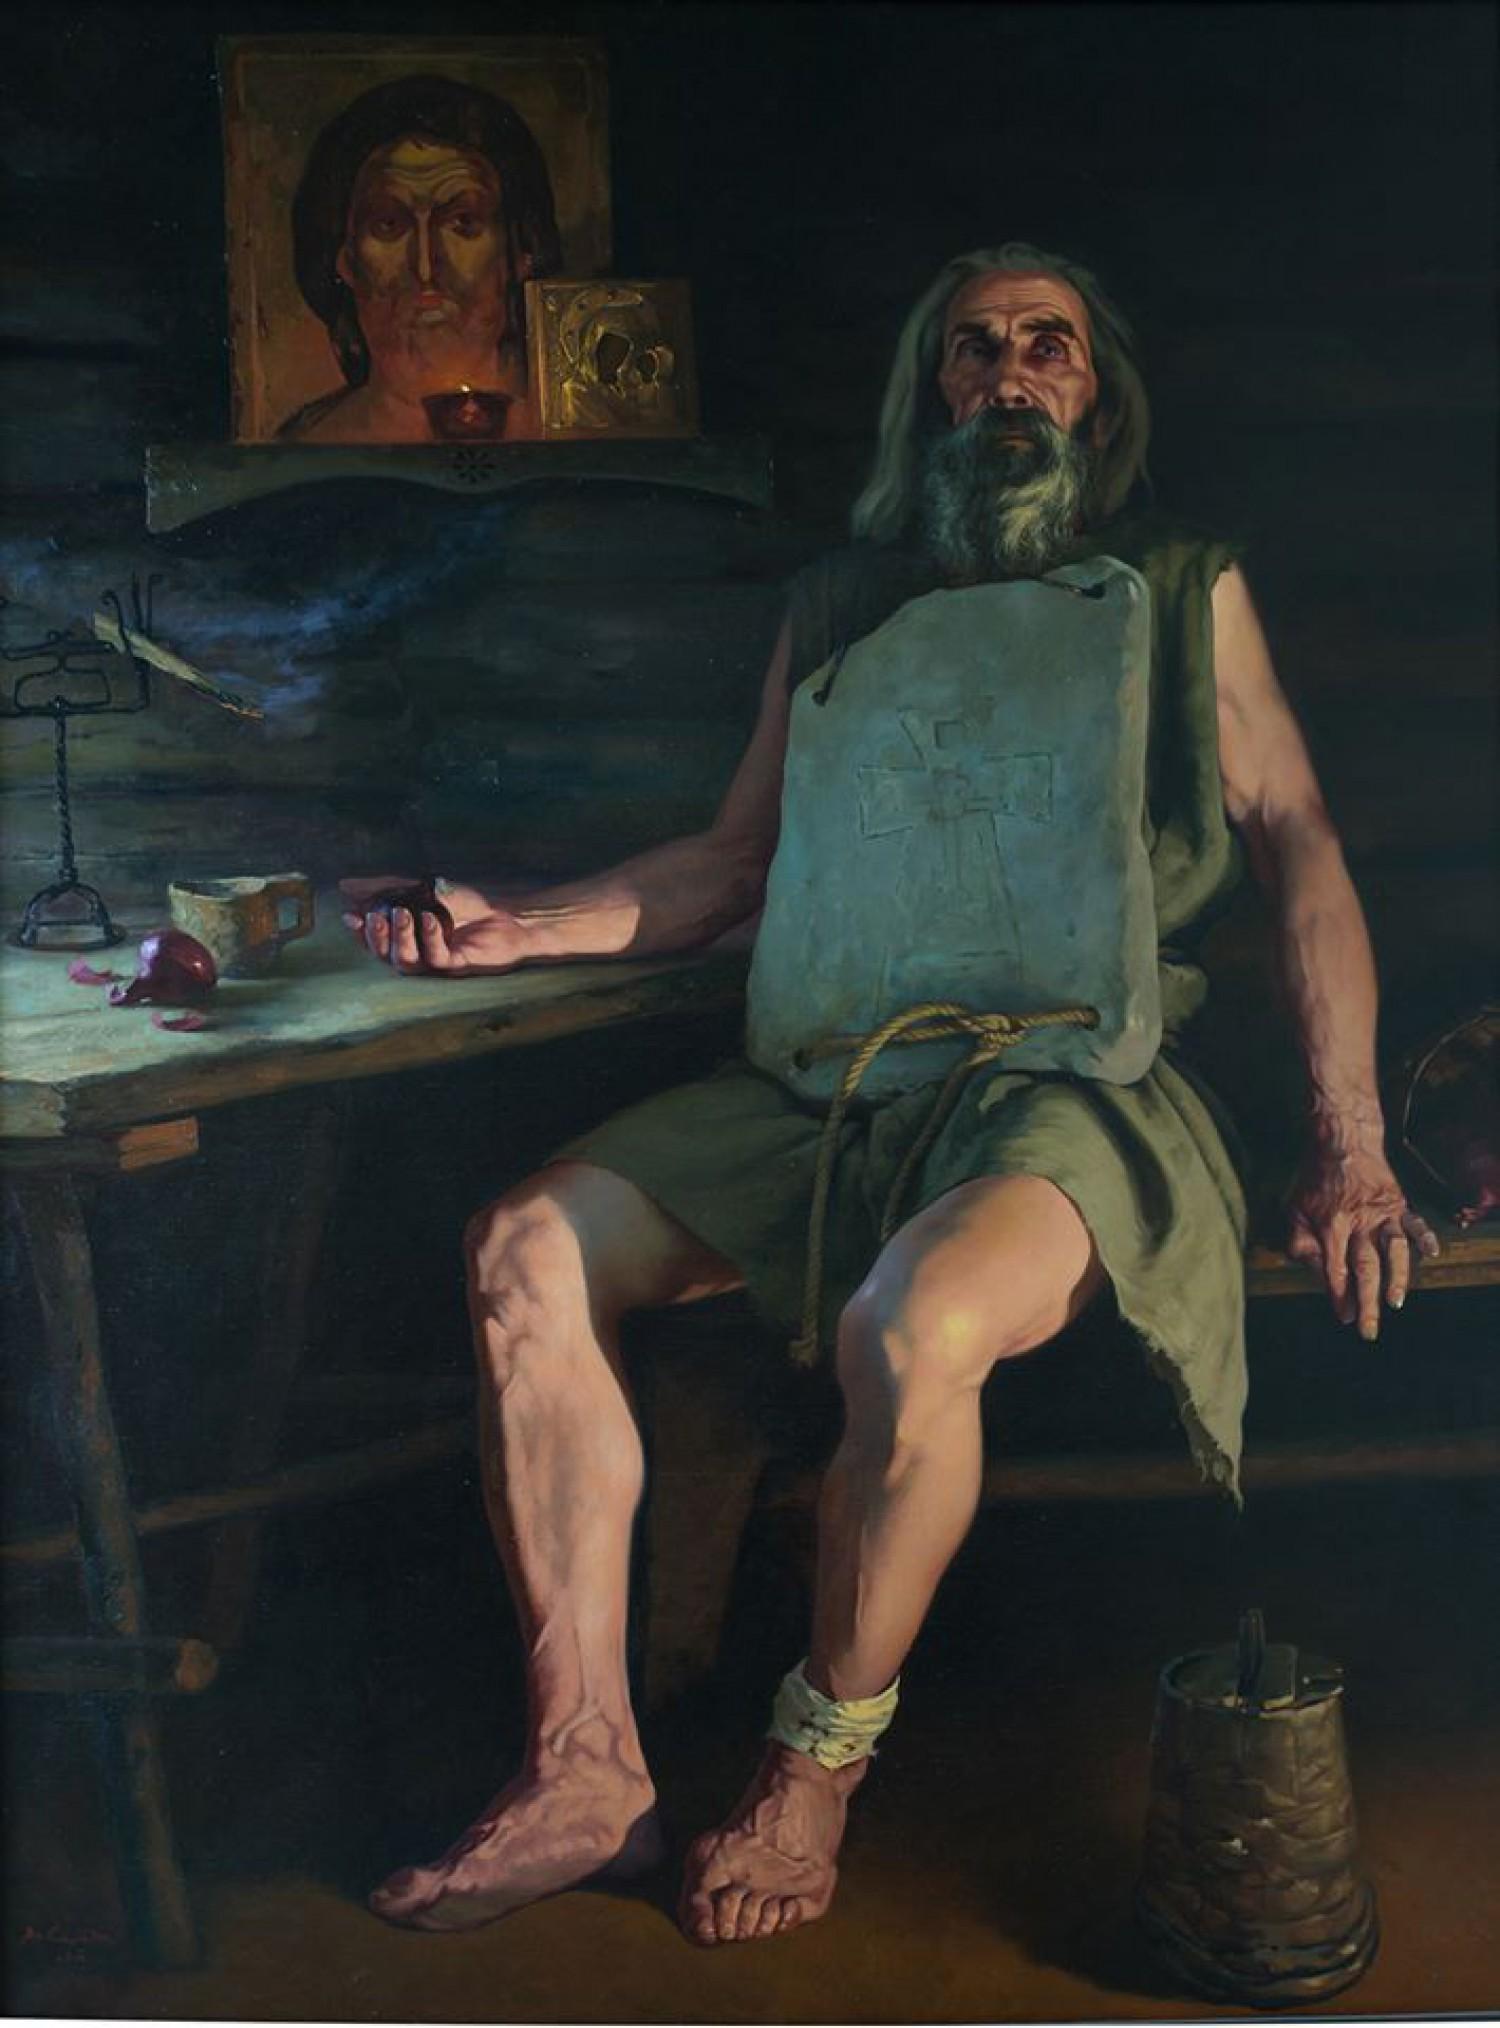 В.М.Барсуков (Середа). Старец Капитон. 2013, холст, масло, 180х135.